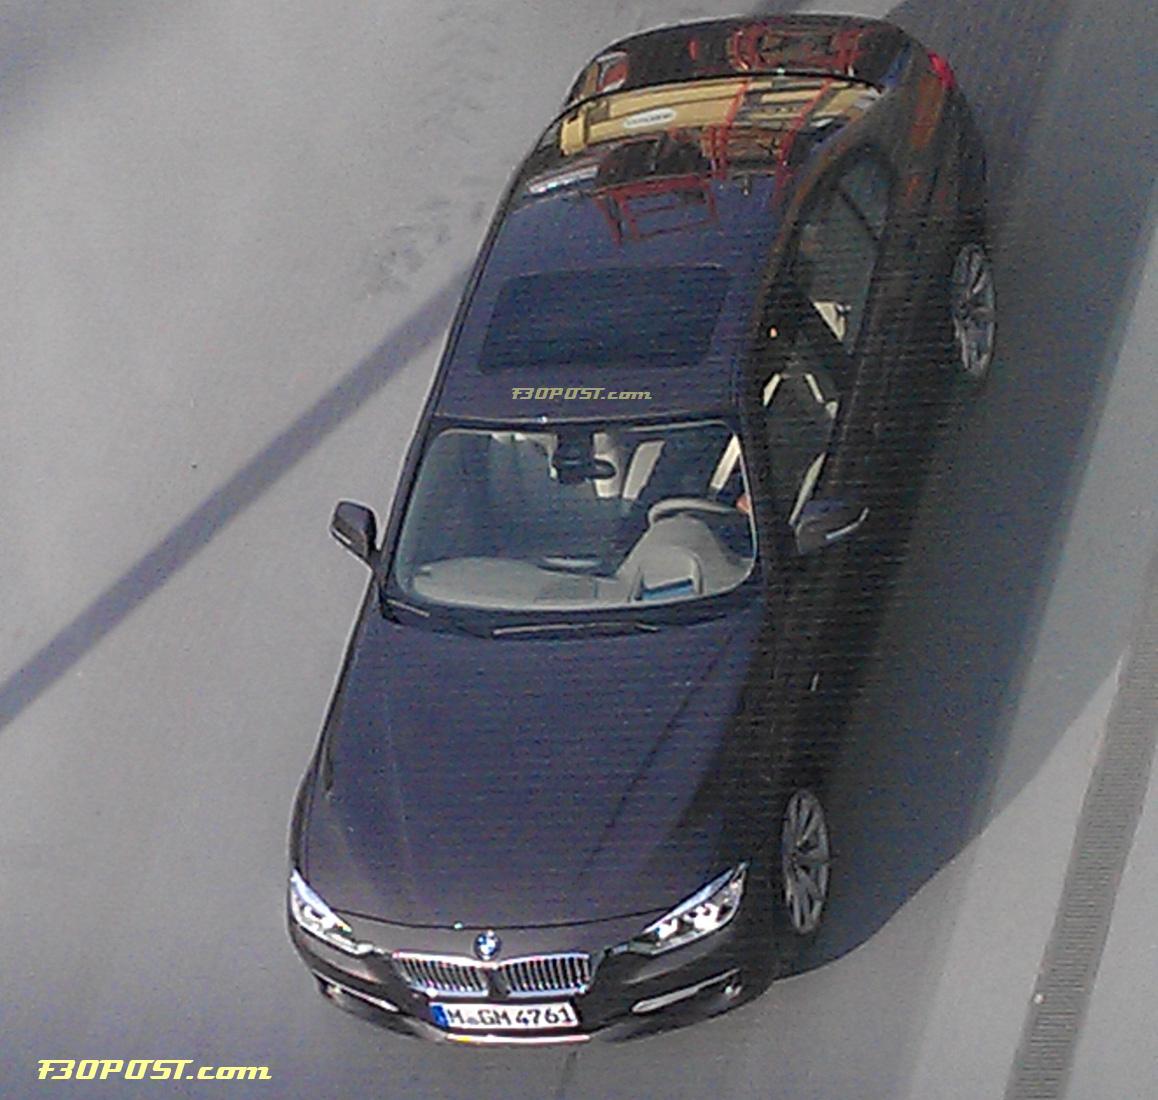 BMW Serie 3 2012 (F30): le immagini senza camuffature